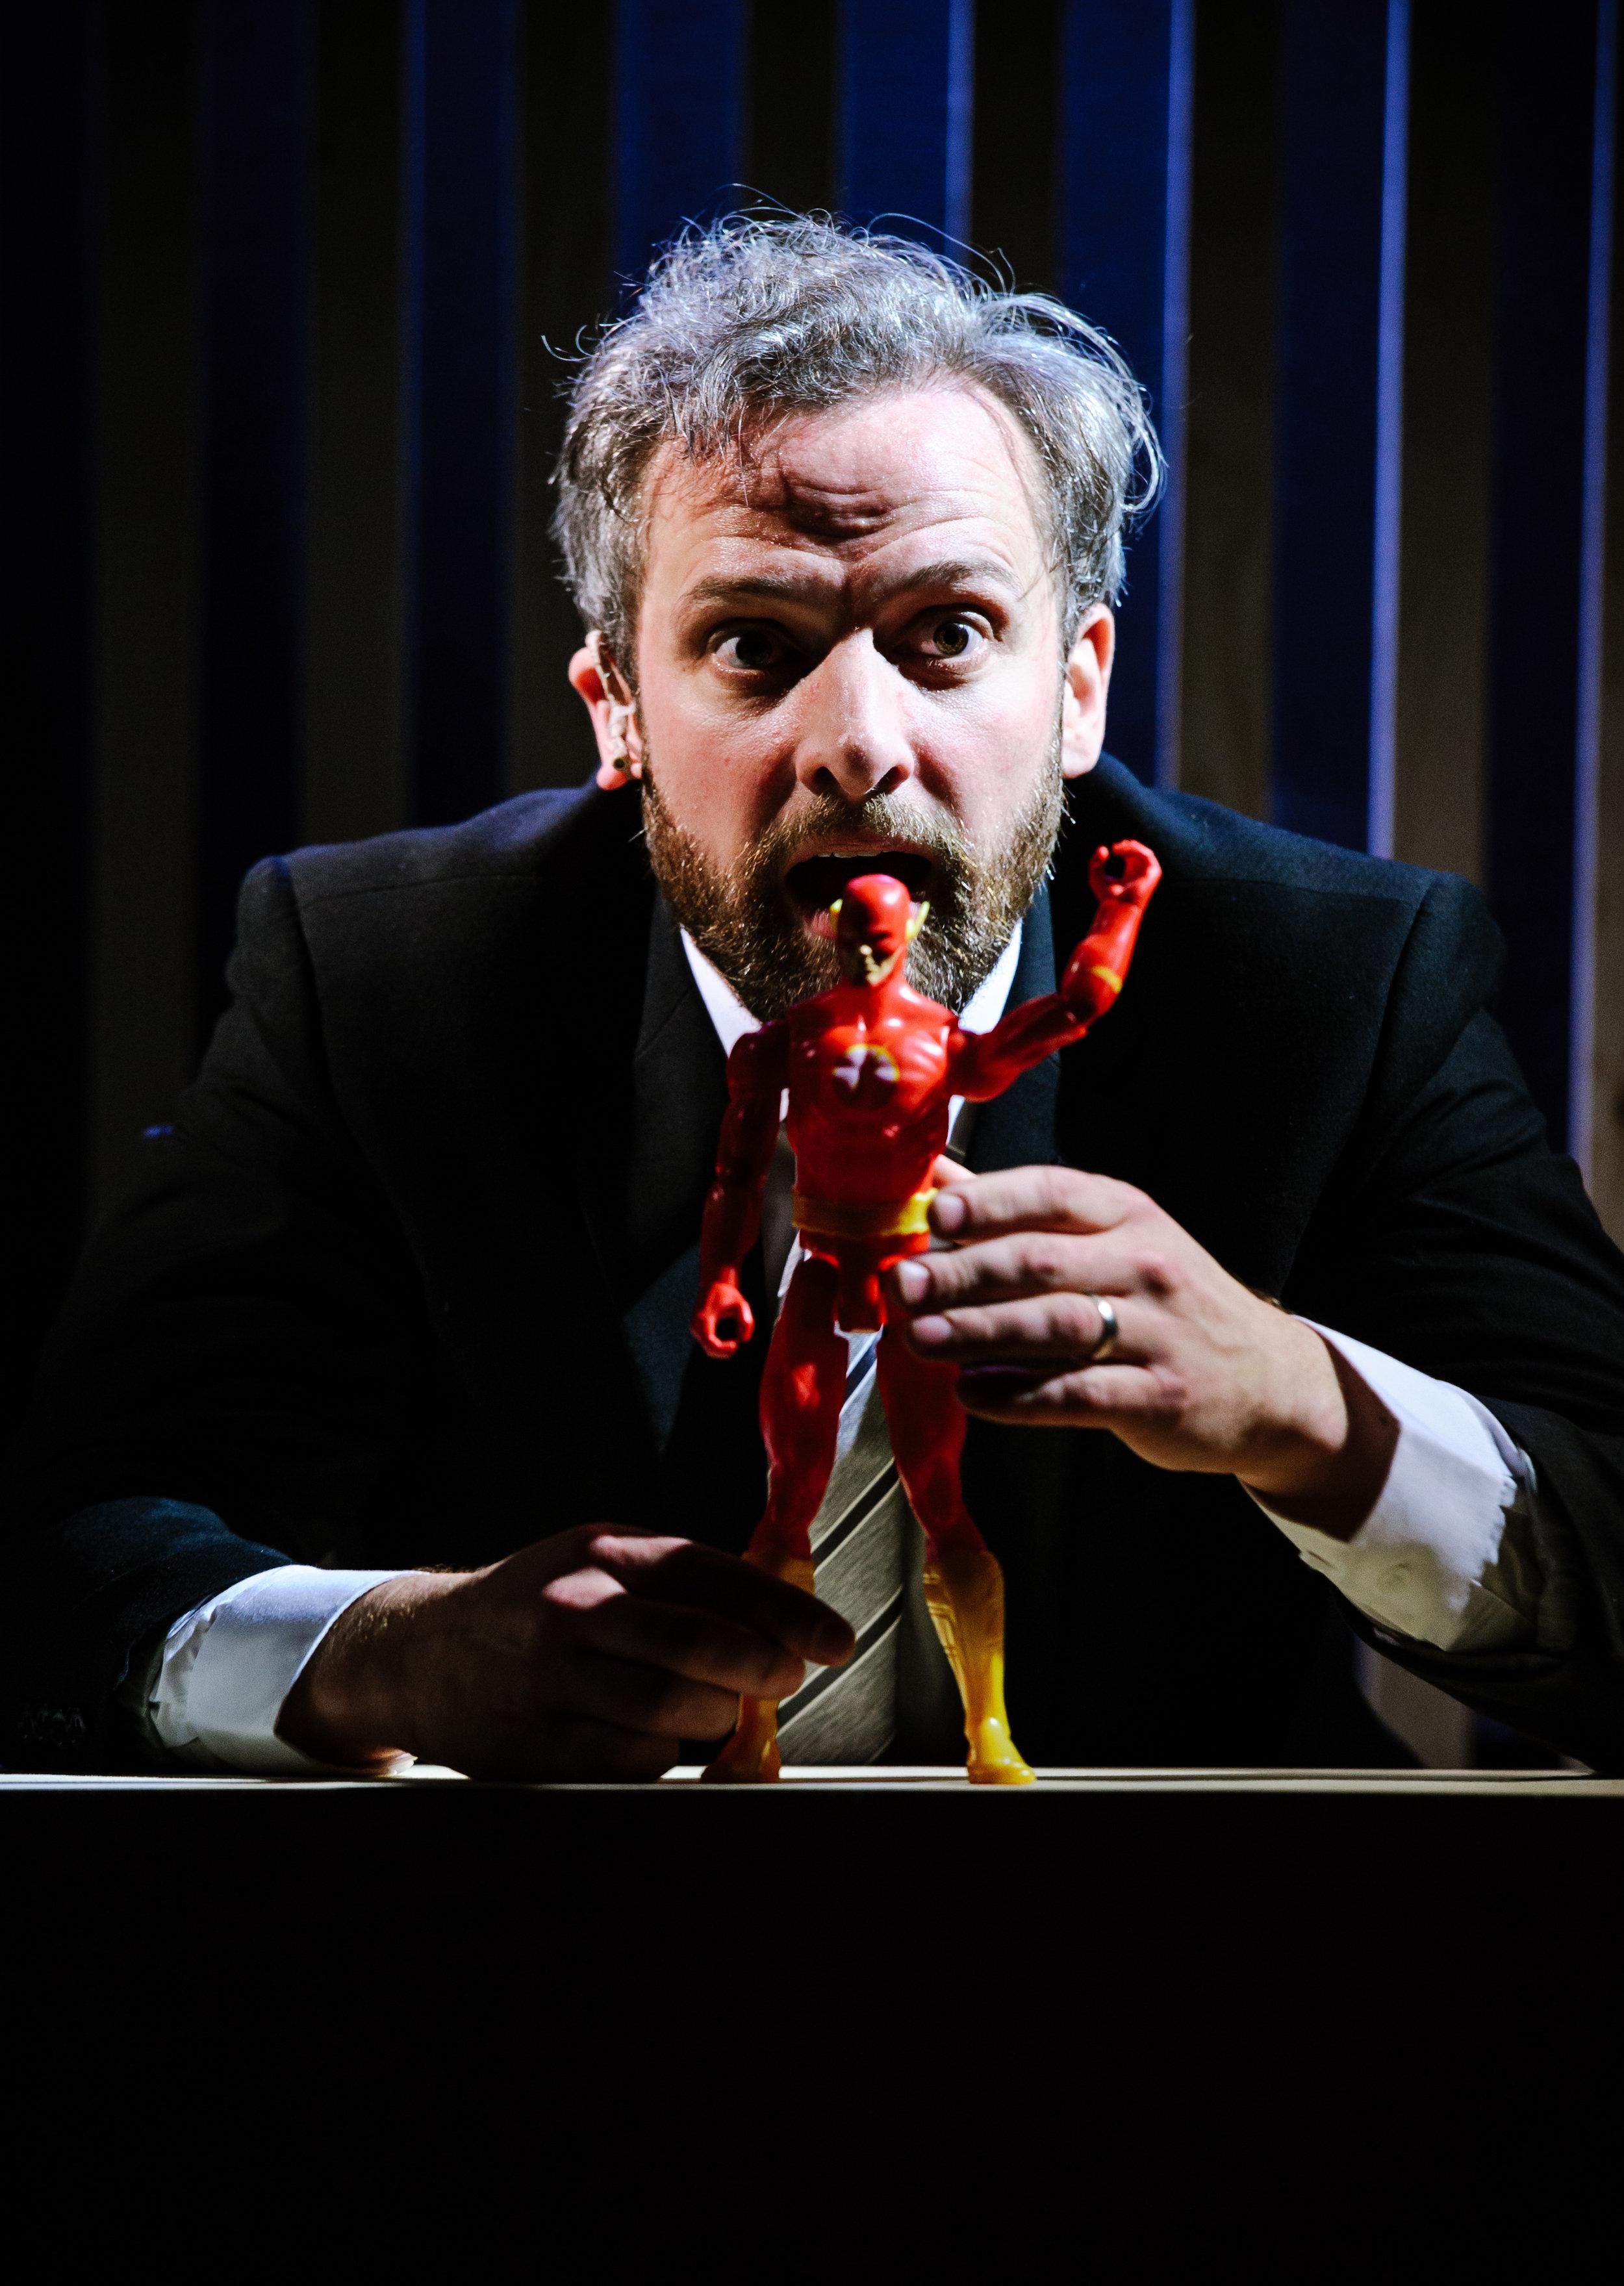 Michael Rouse in Superhero at Southwark Playhouse. Credit Alex Brenner (2).jpg